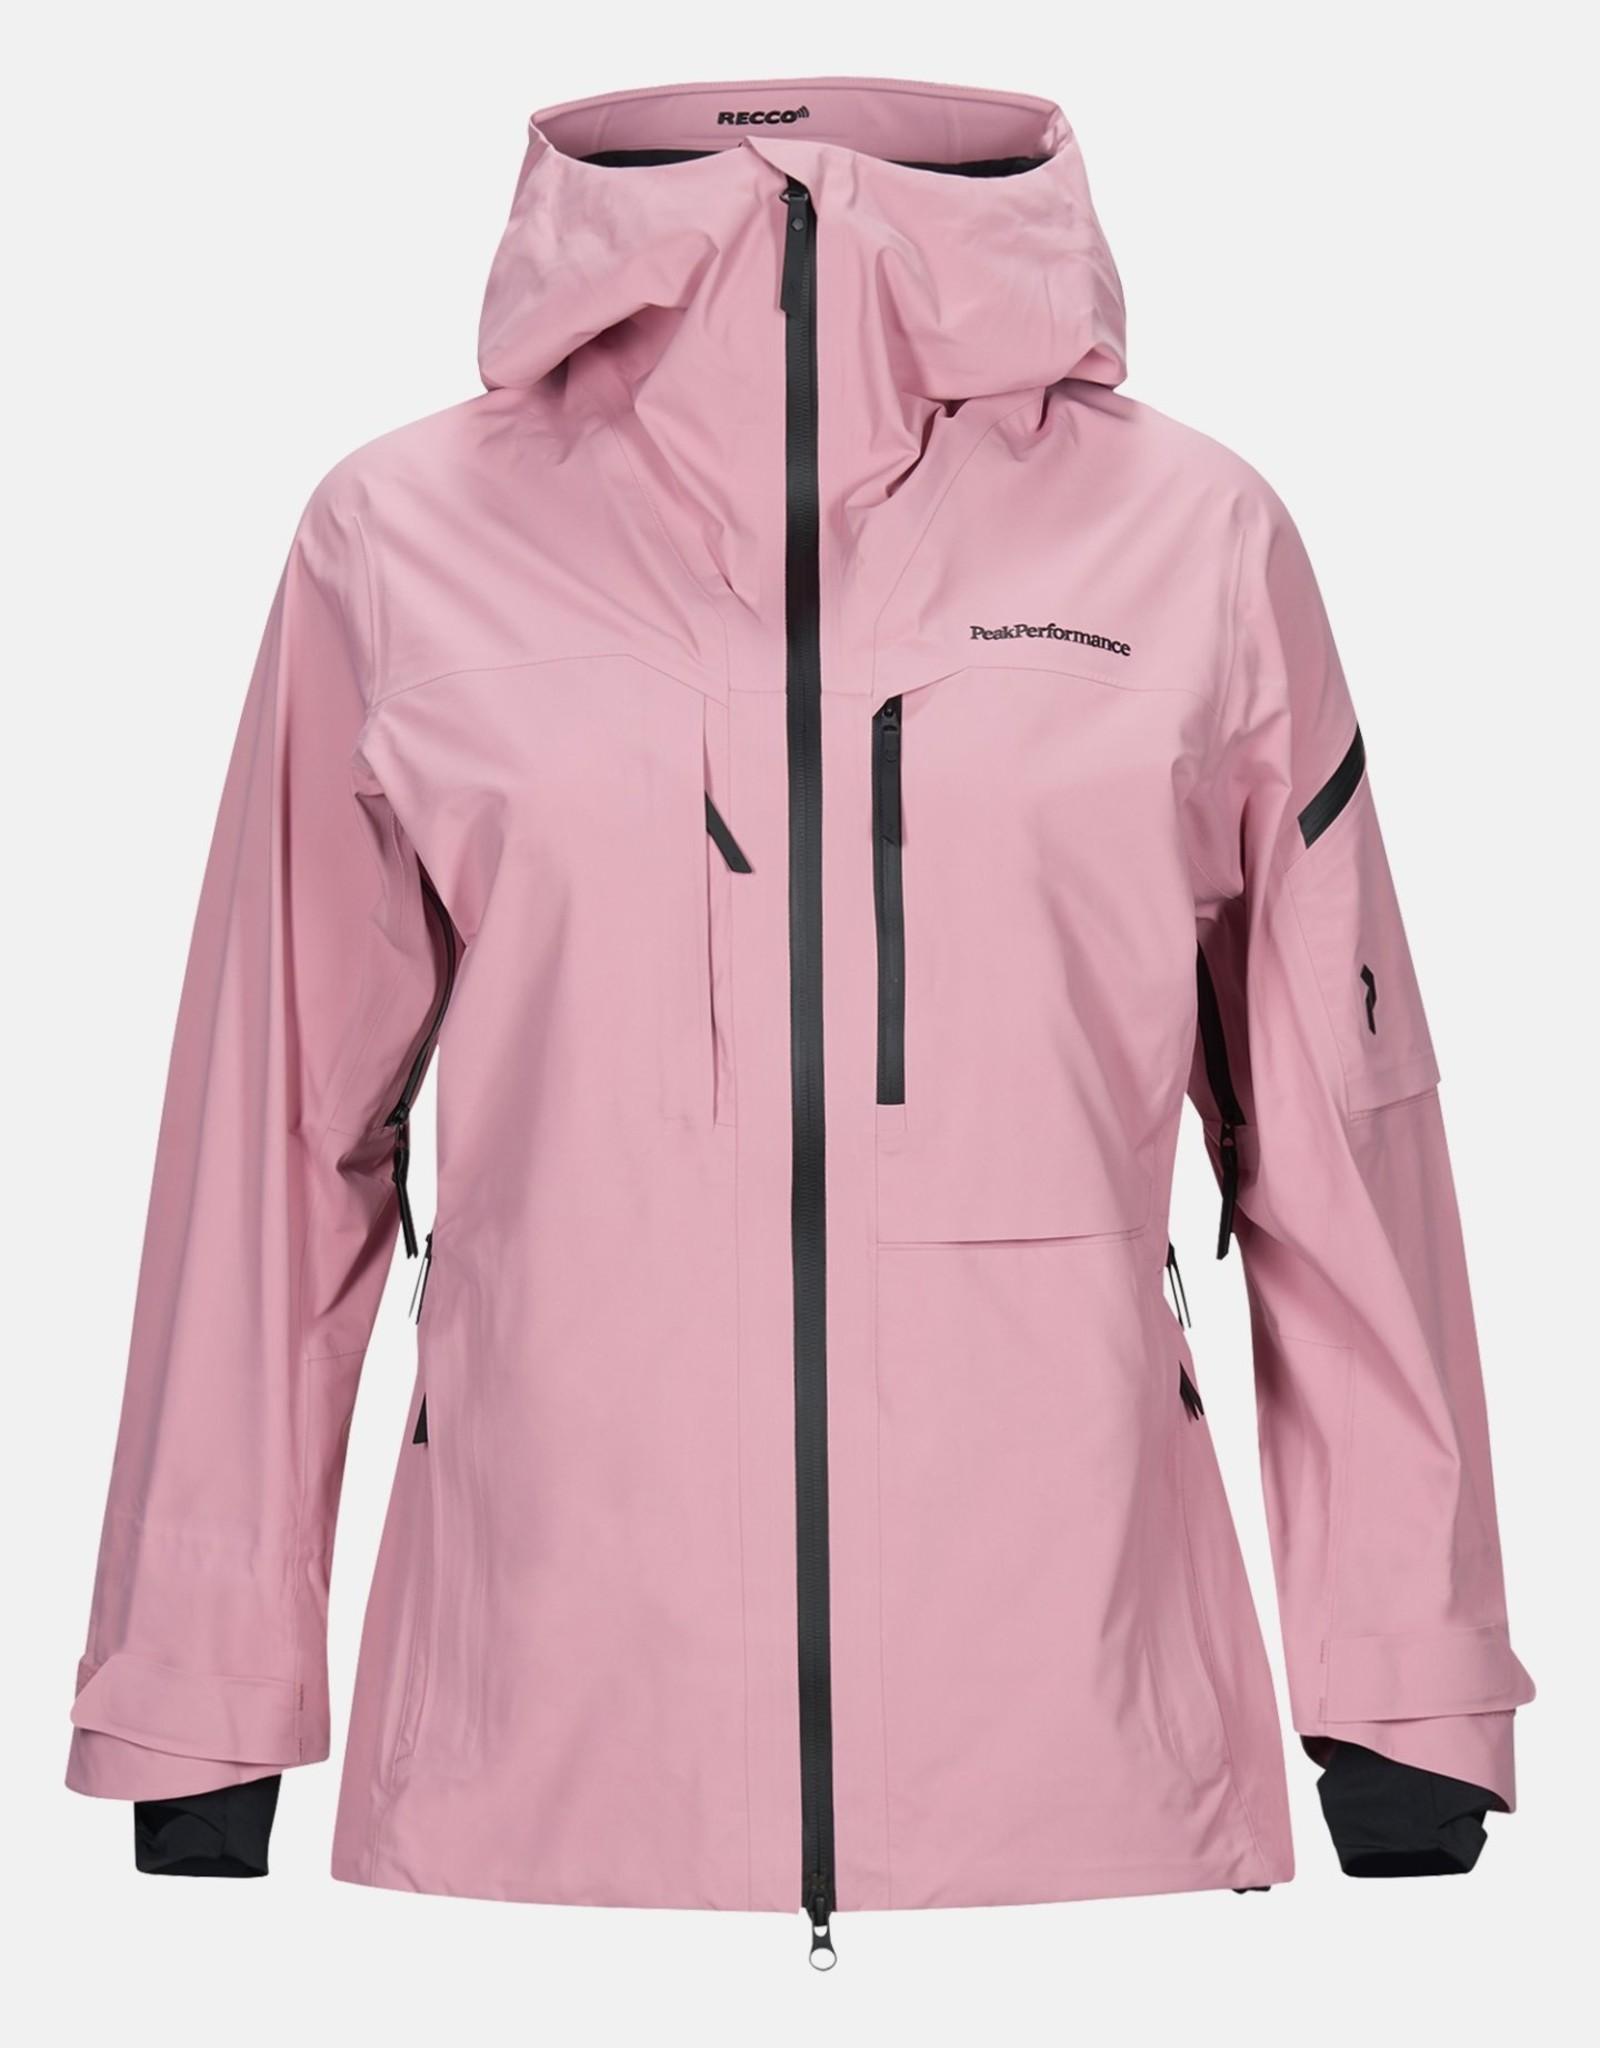 Peak Performance Peak Performance Women's Alpine Jacket  -W2020